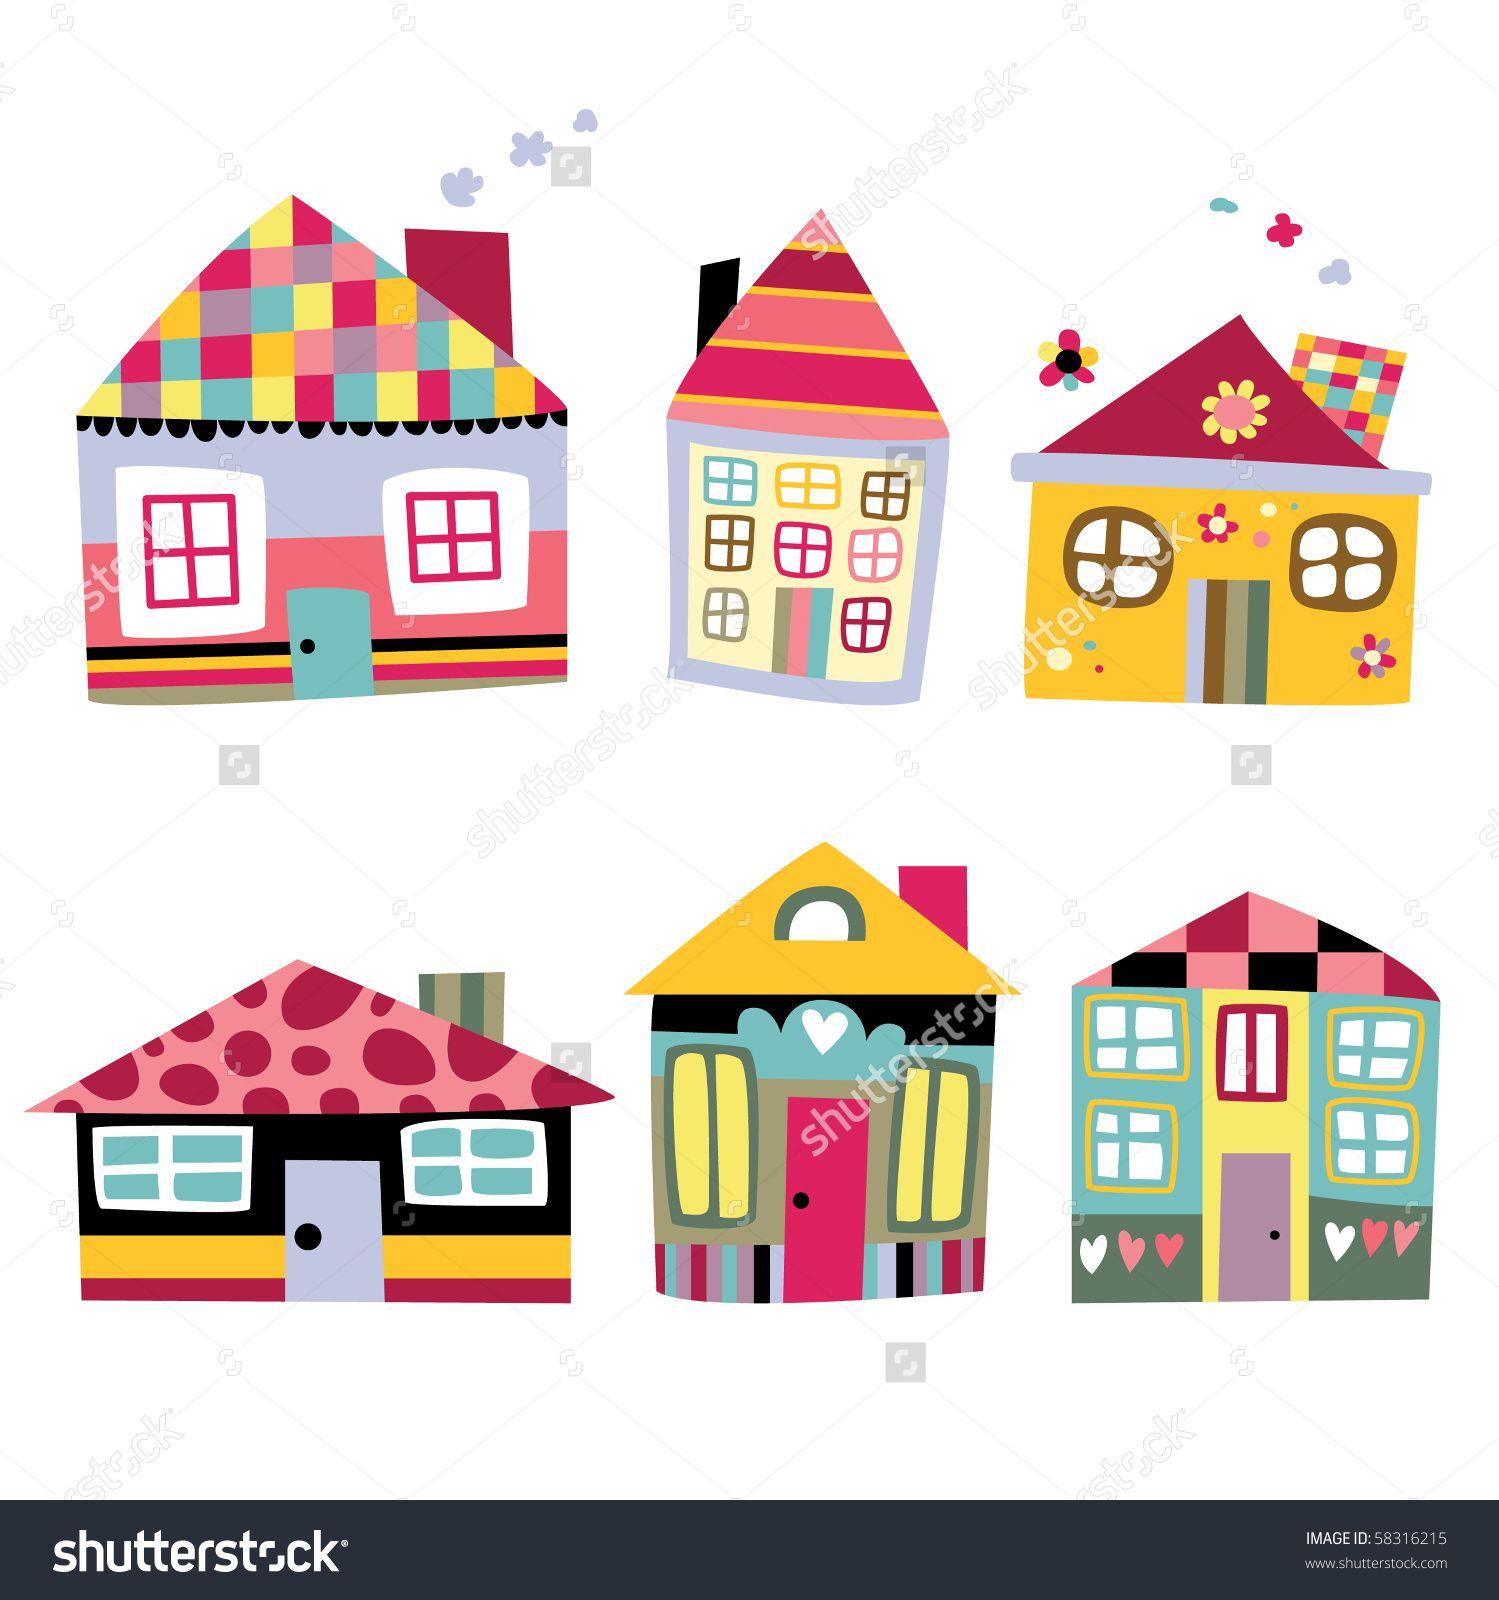 Cute House Template Google Search Cute House House